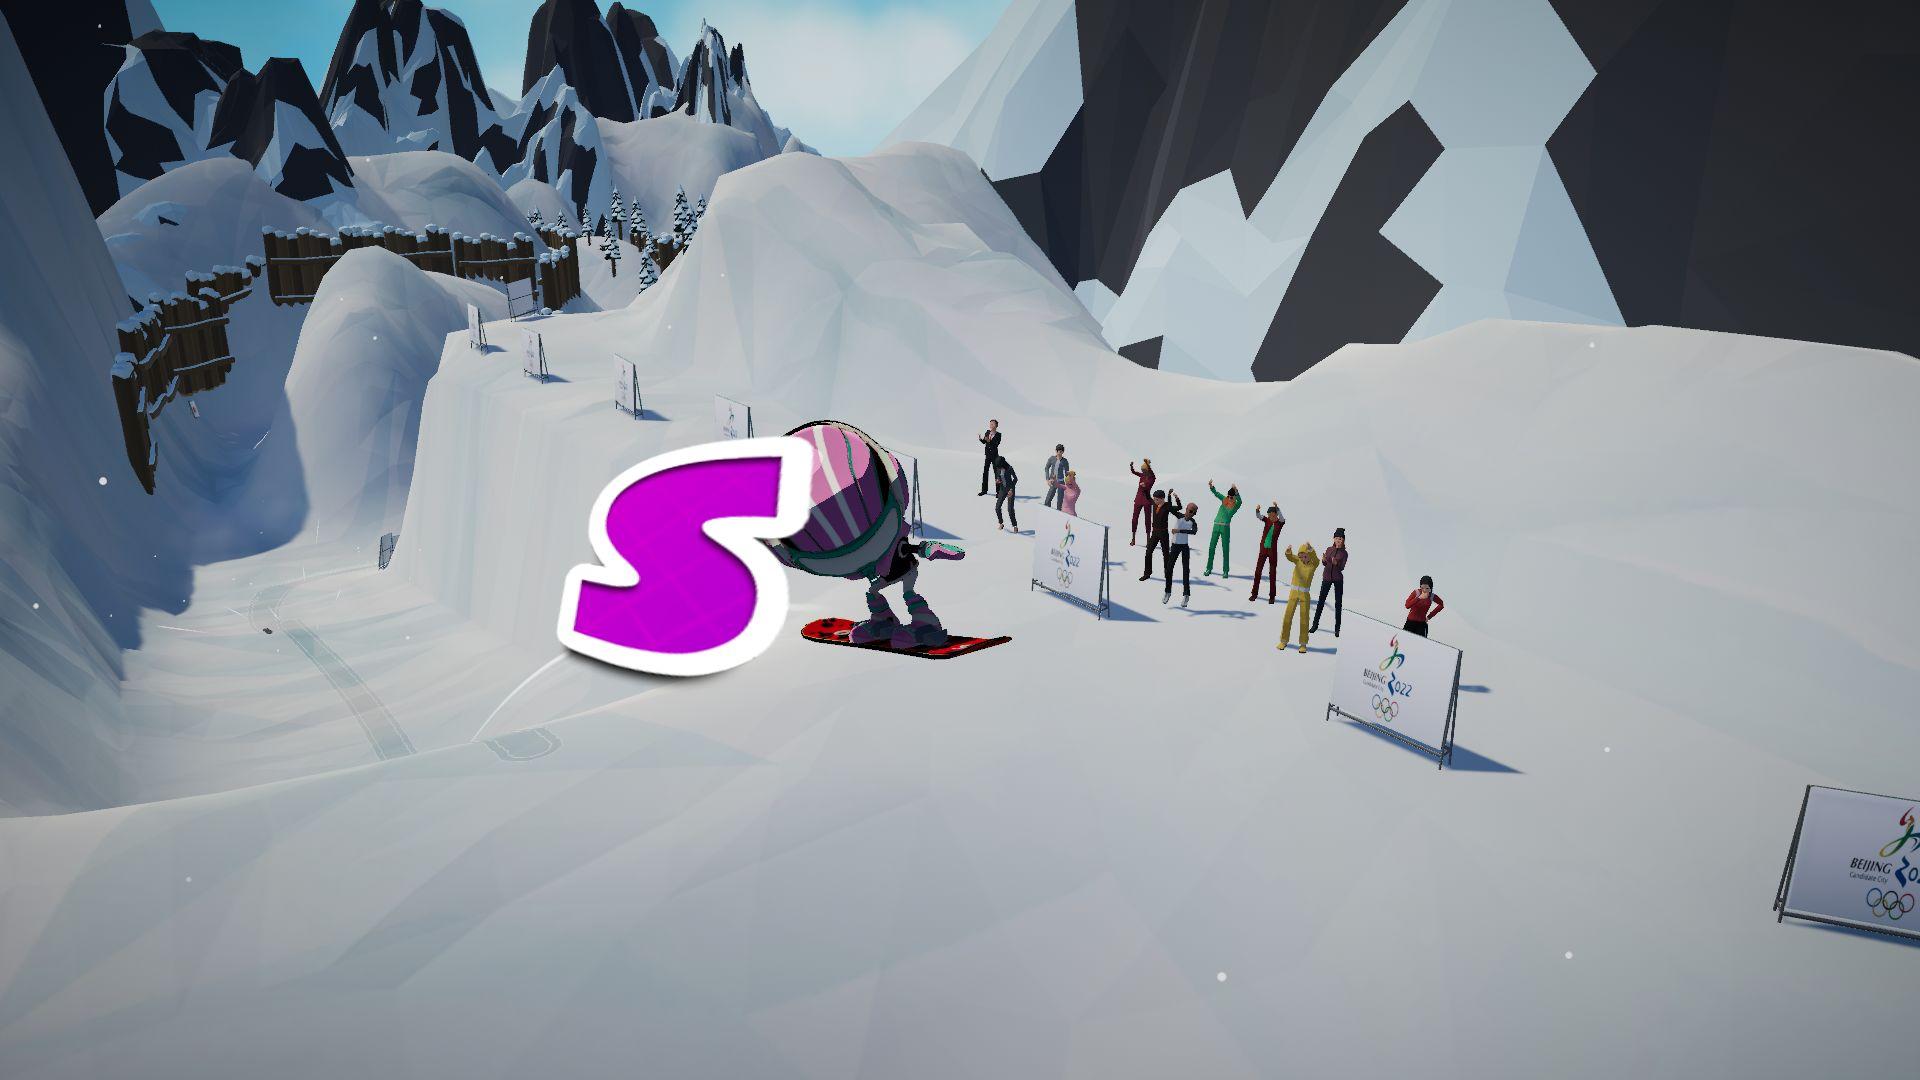 SkiParty